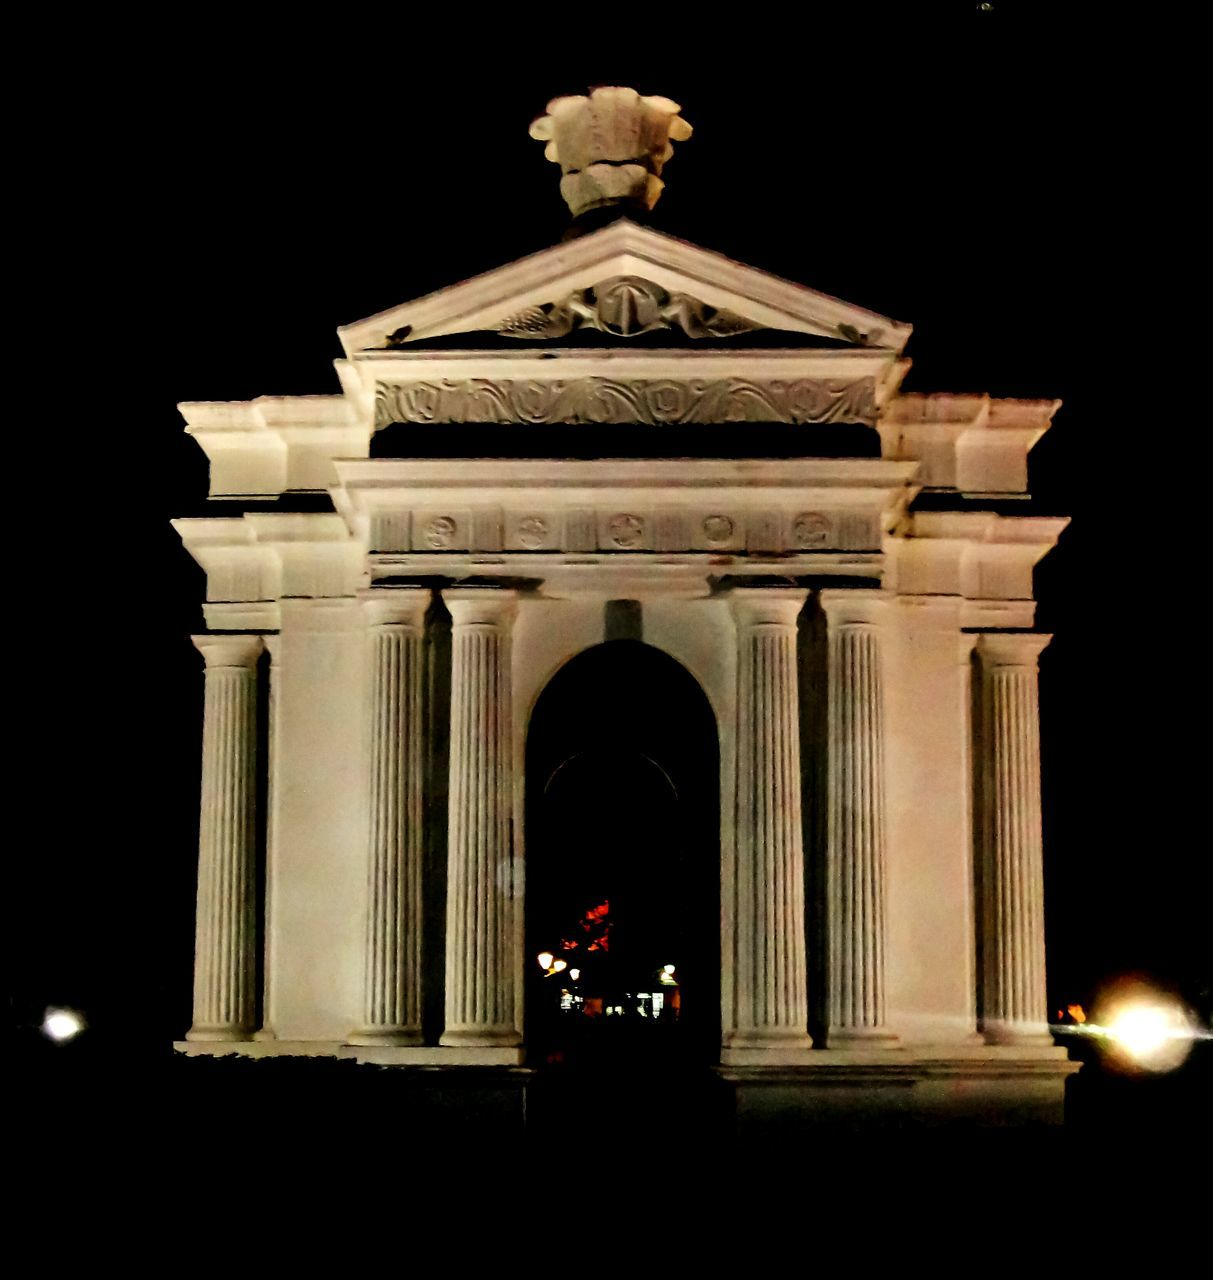 Illuminated Monument At Night